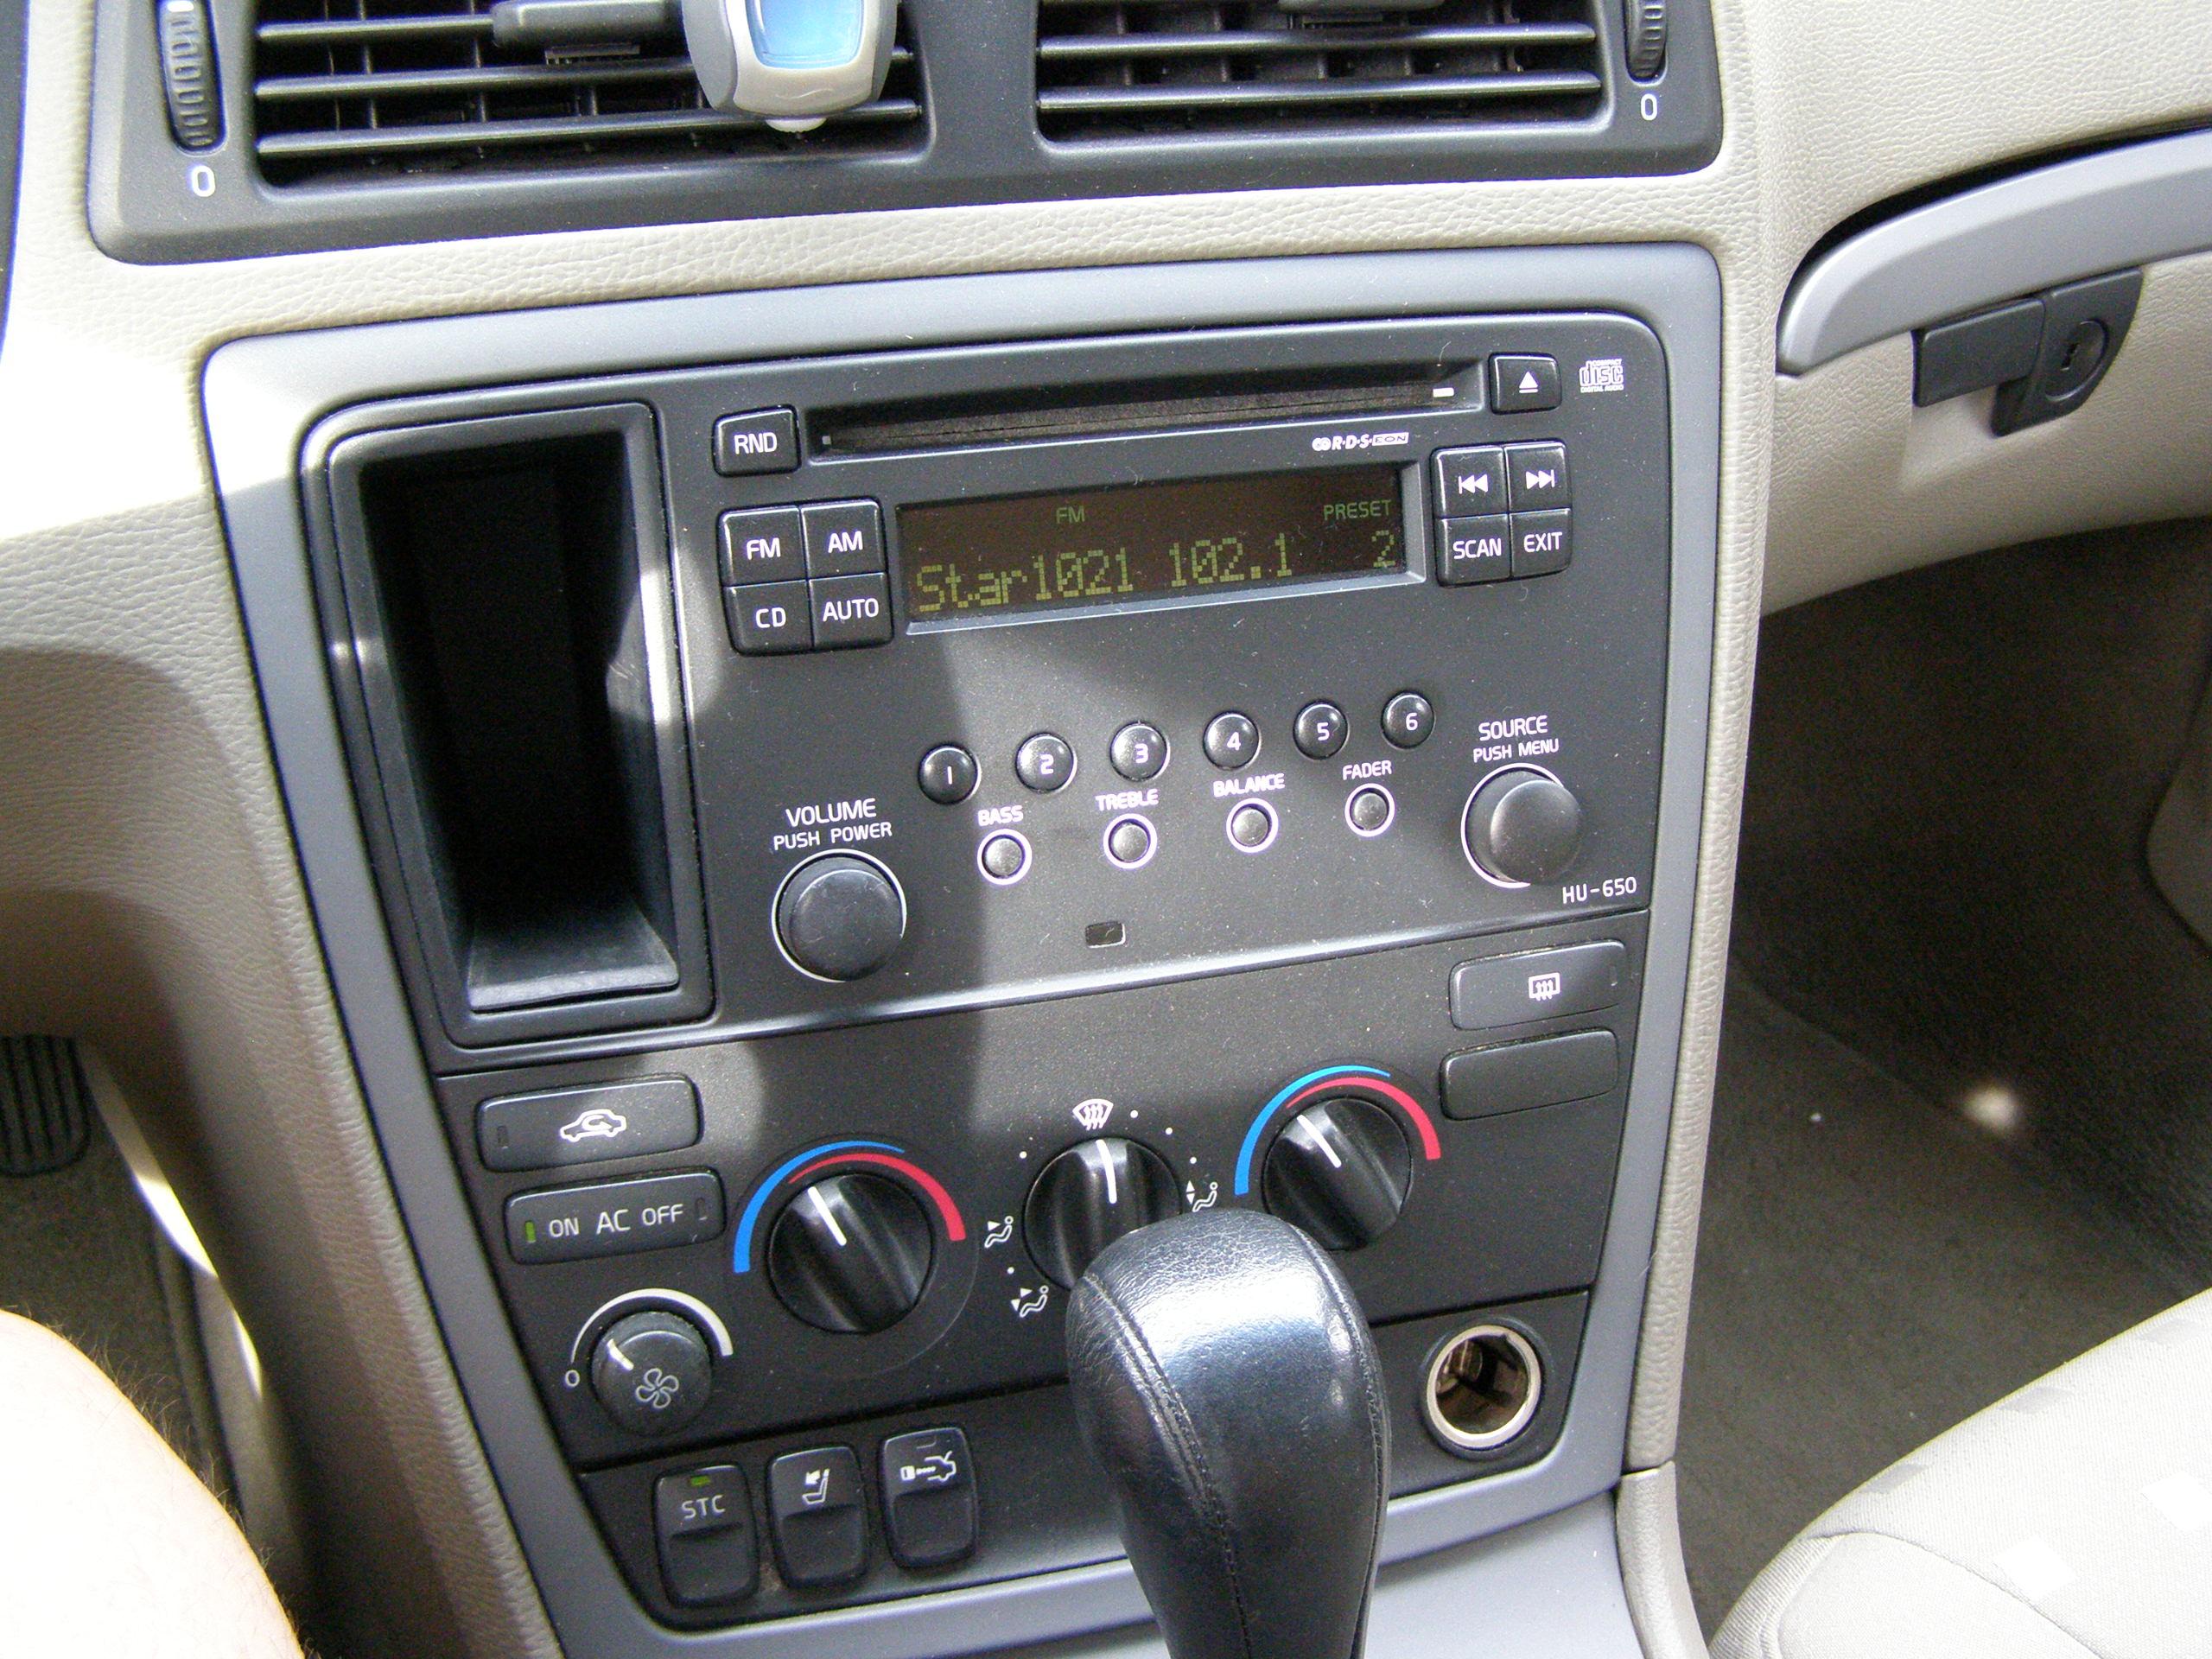 2005 S60 Radio Replacement